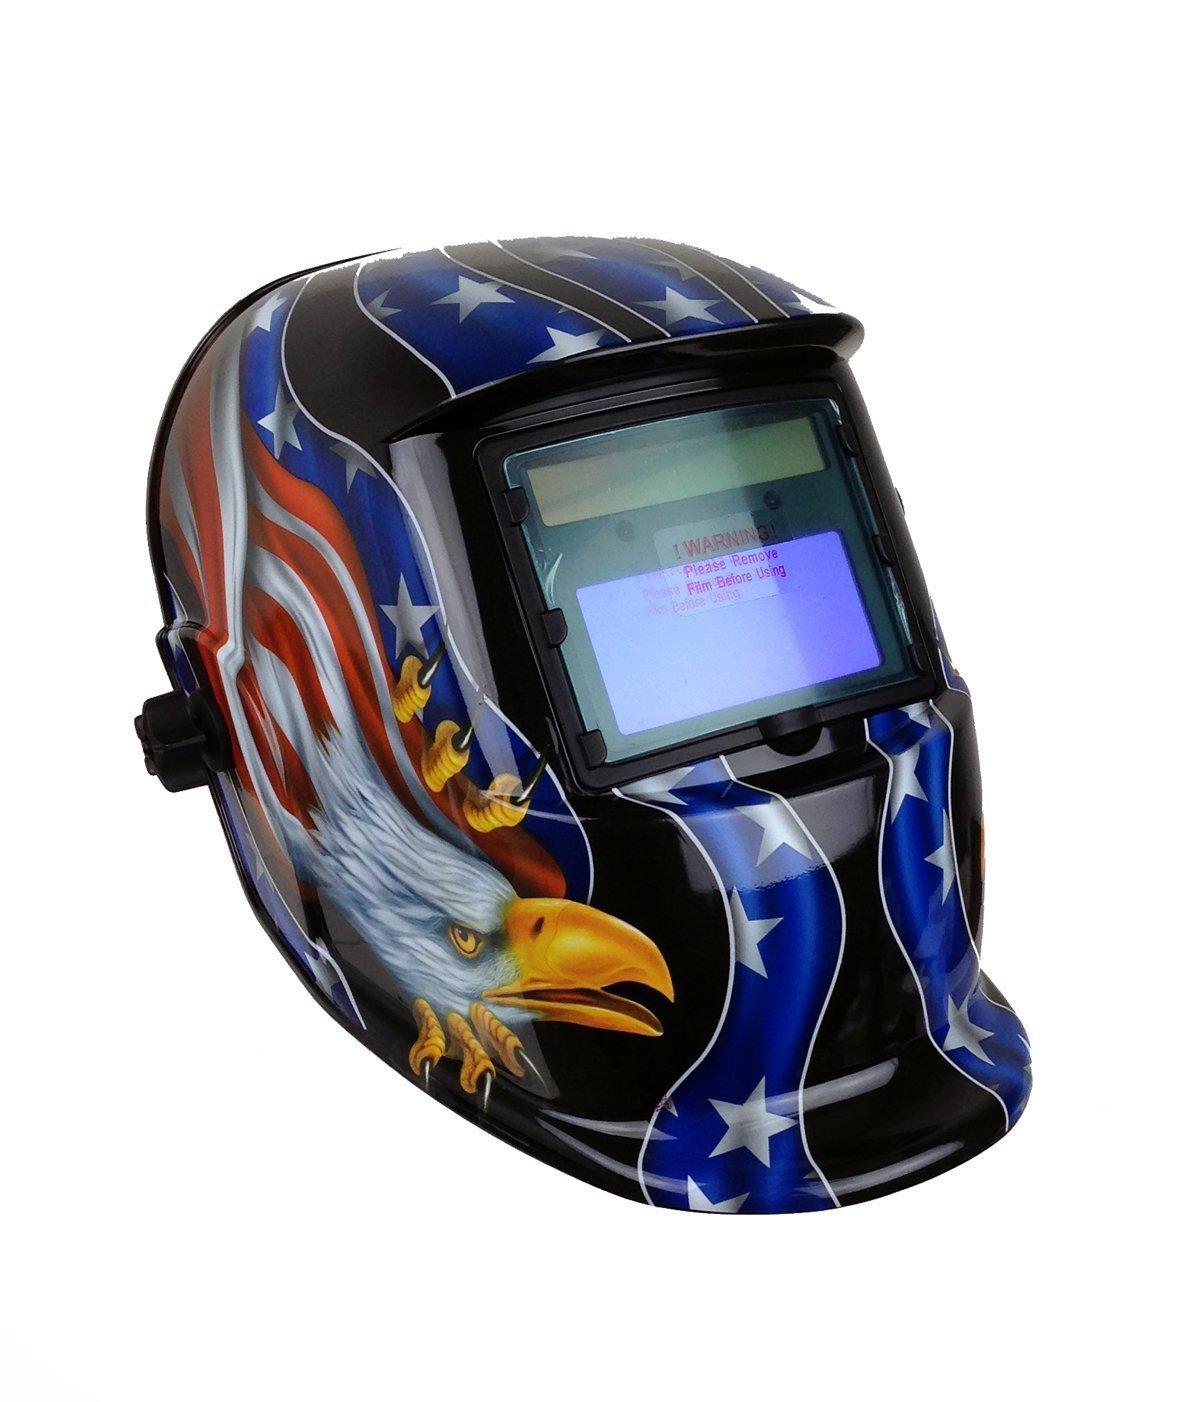 Instapark ADF Series GX 500S Solar Powered Auto Darkening Welding Helmet with Adjustable Shade Range #9 #13 American Eagle